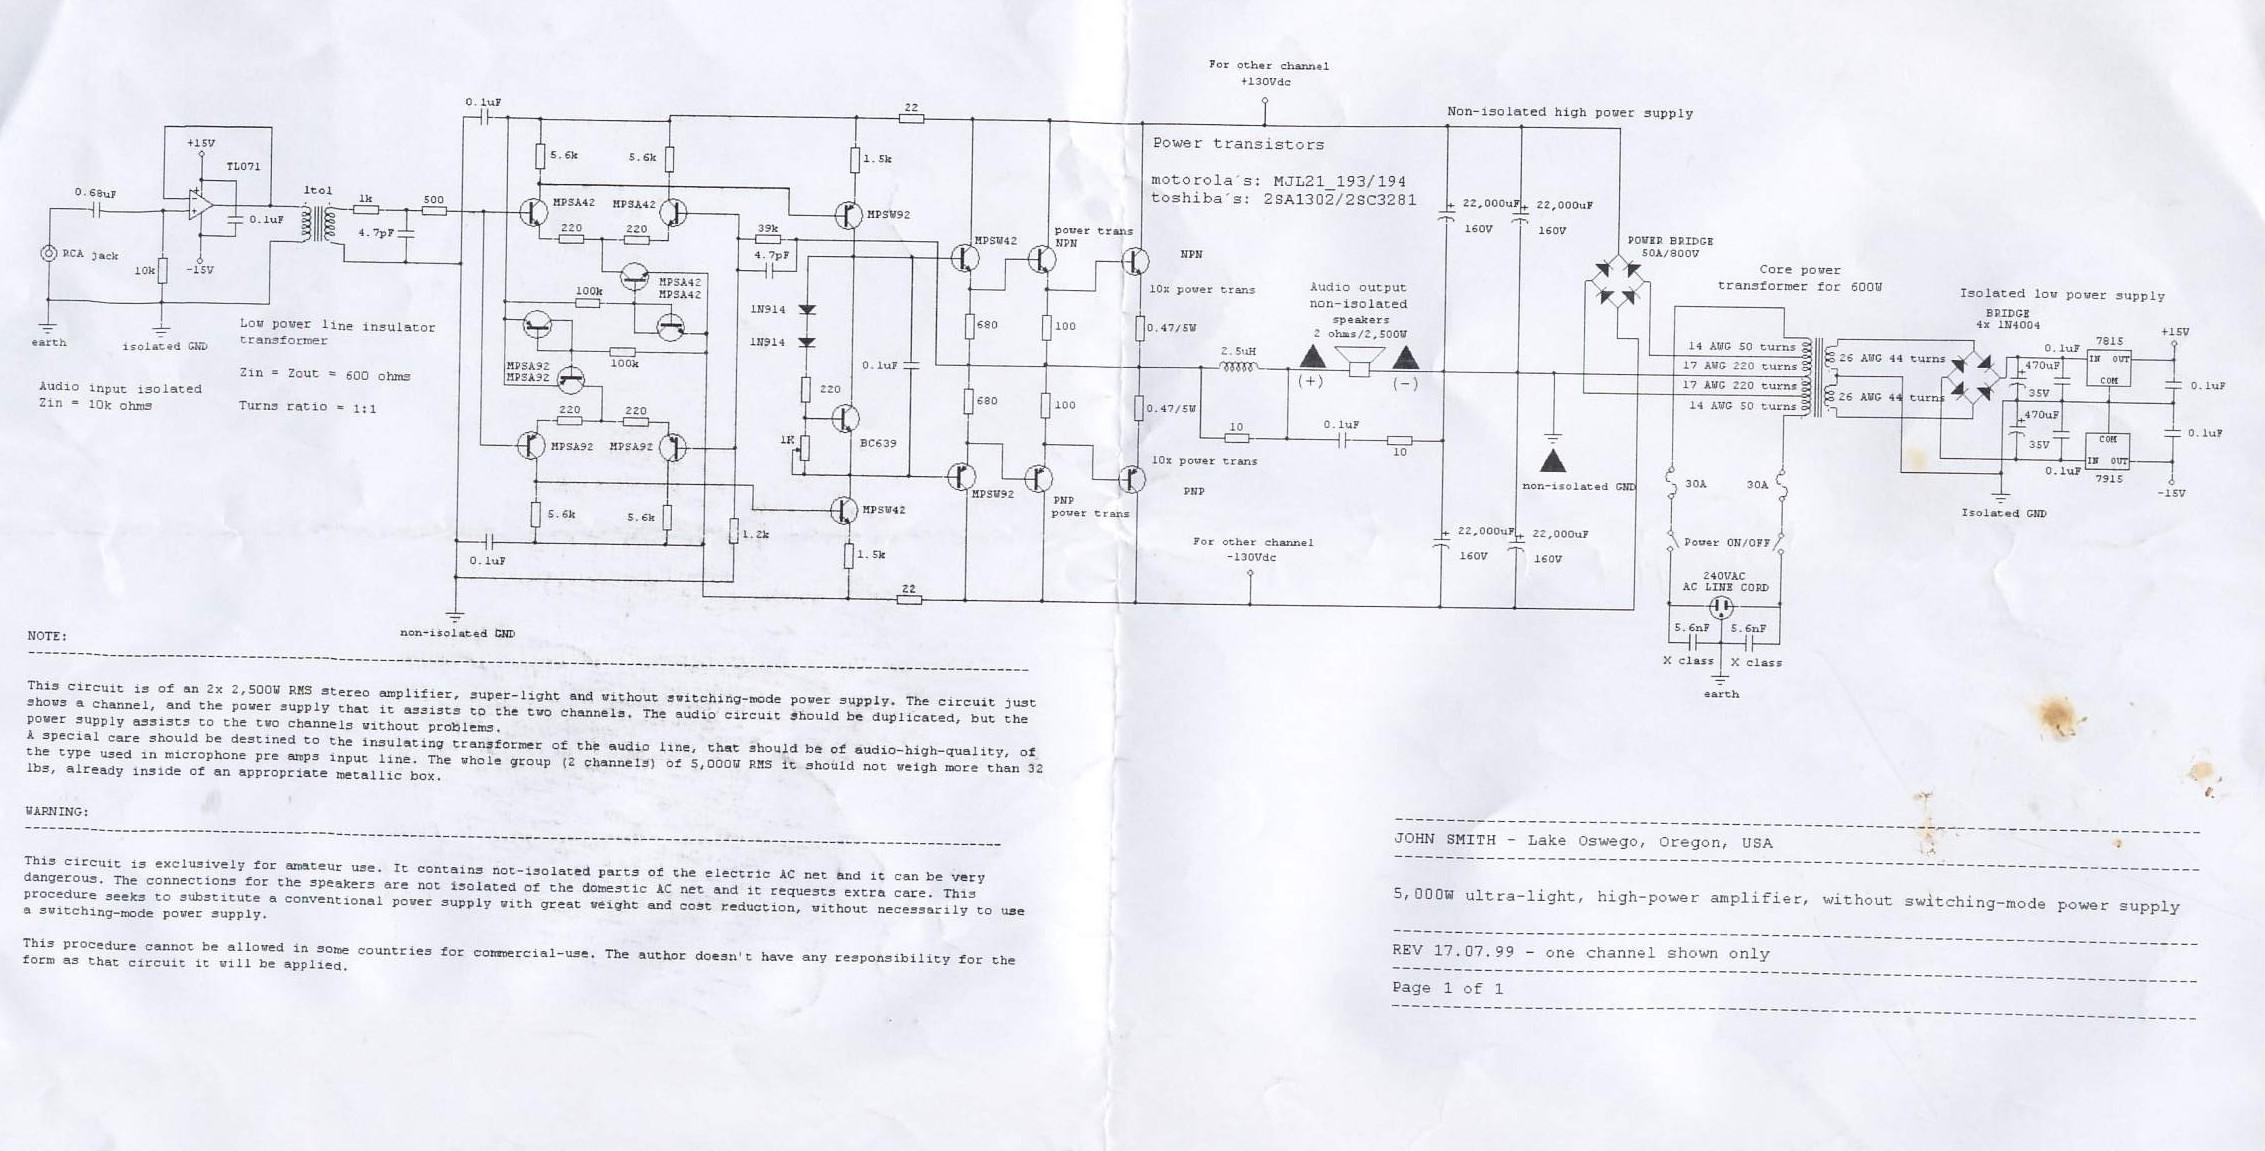 5000 watt amplifier circuit diagram how to make a phasor 5000w ultra light high power electronics lab